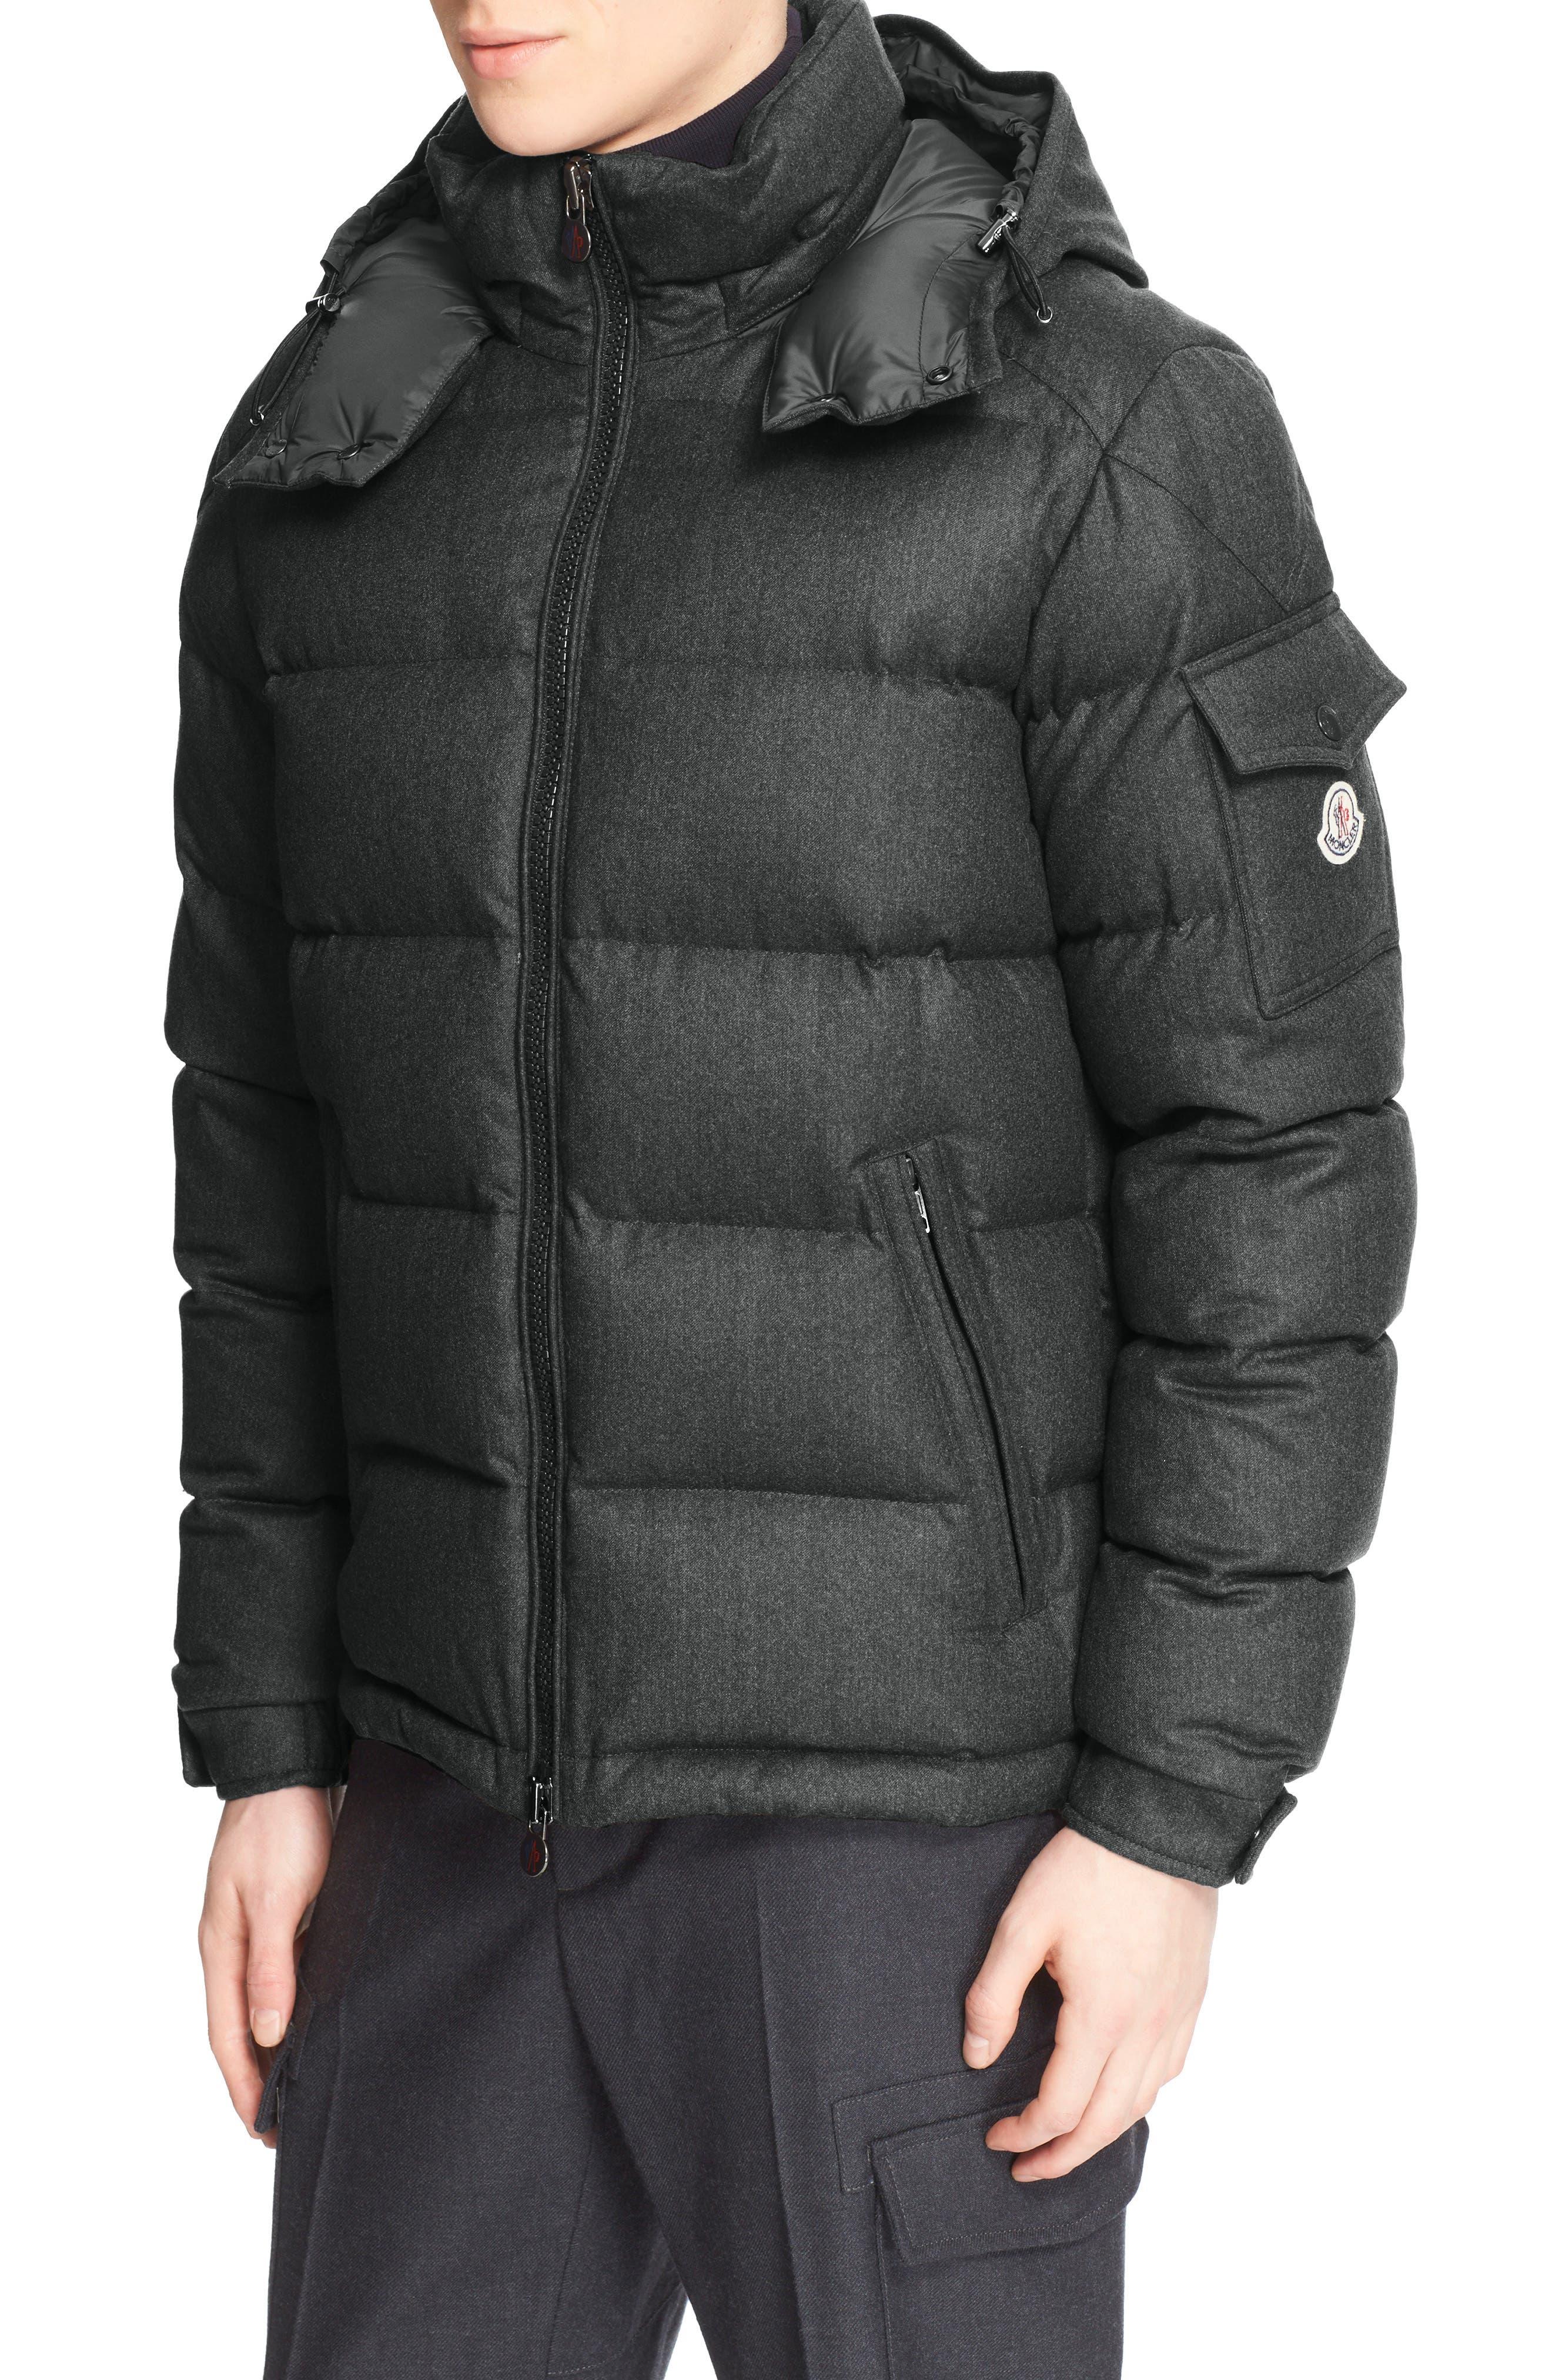 Moncler 'Montgenevre' Quilted Down Jacket